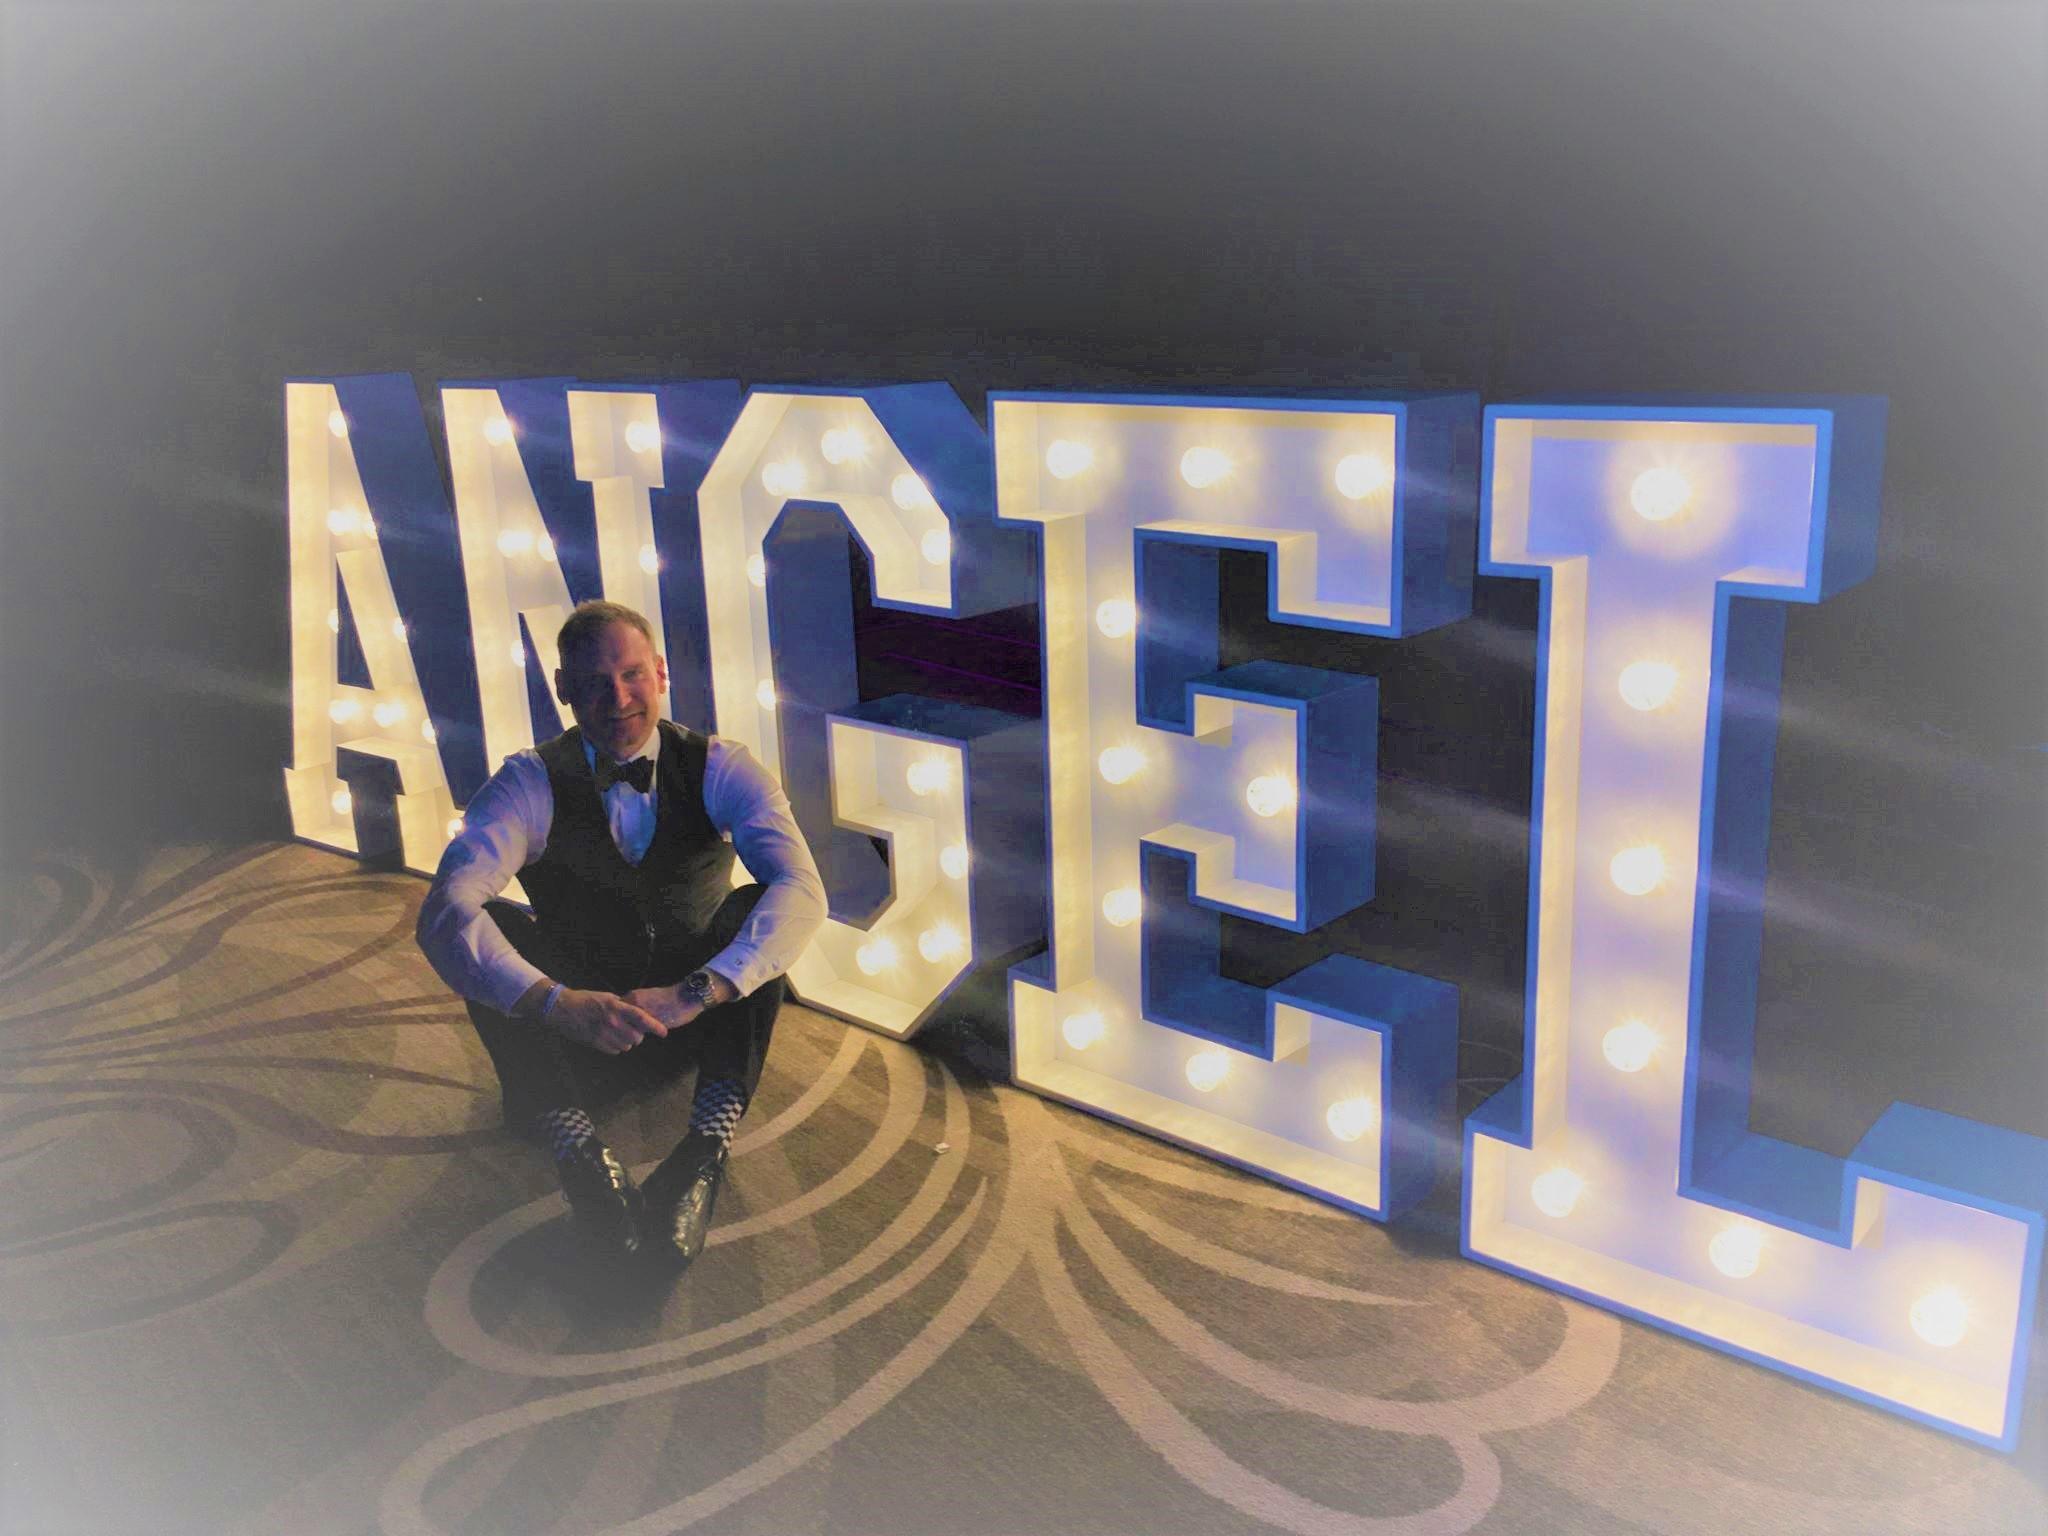 Ian Angel